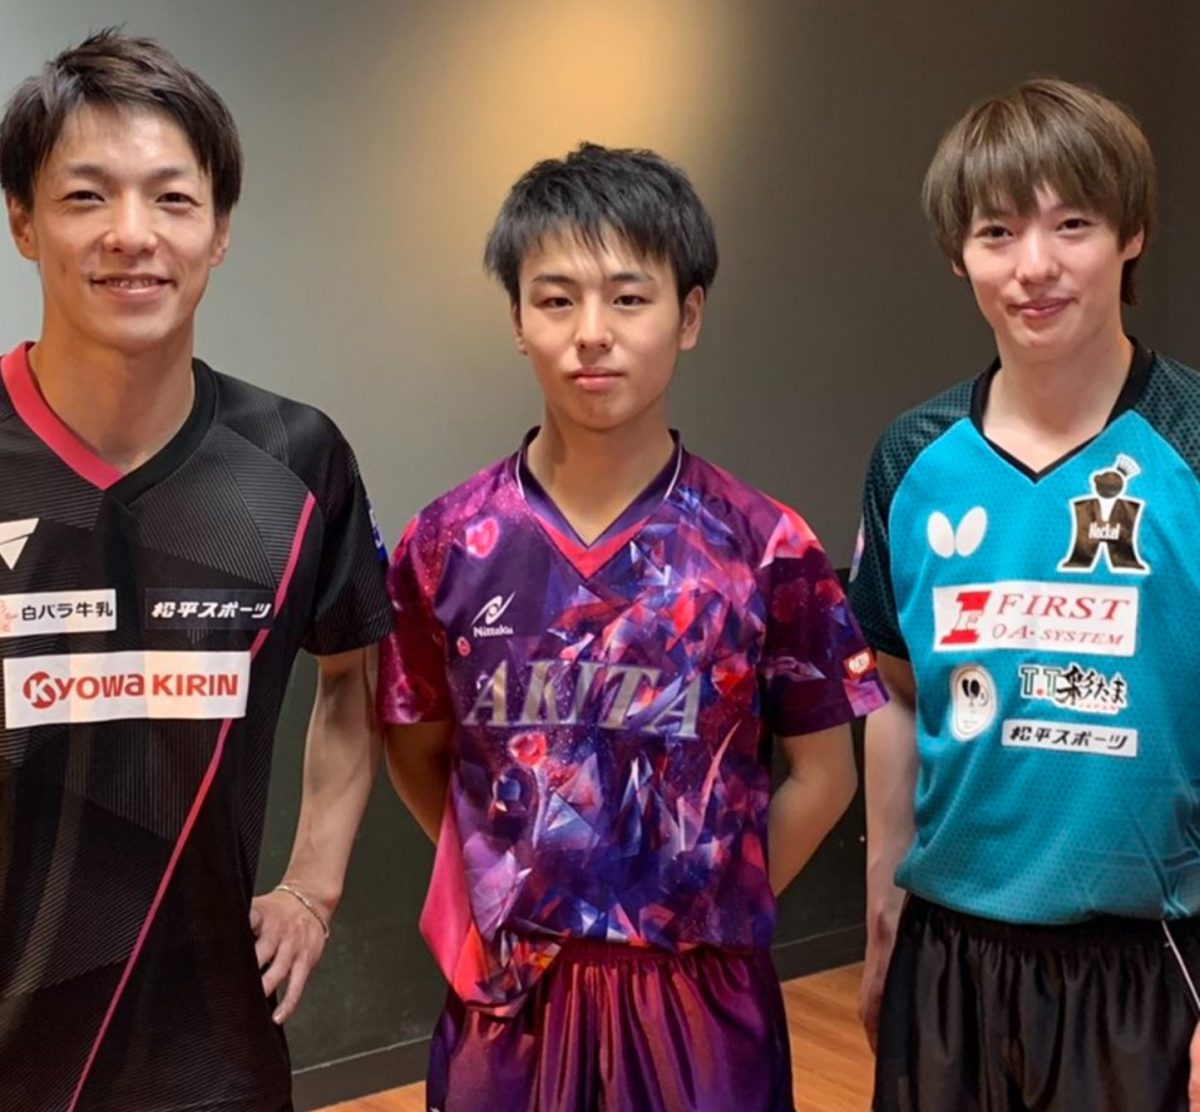 左から松平賢二、米田裕哉(秋田高)、松平健太